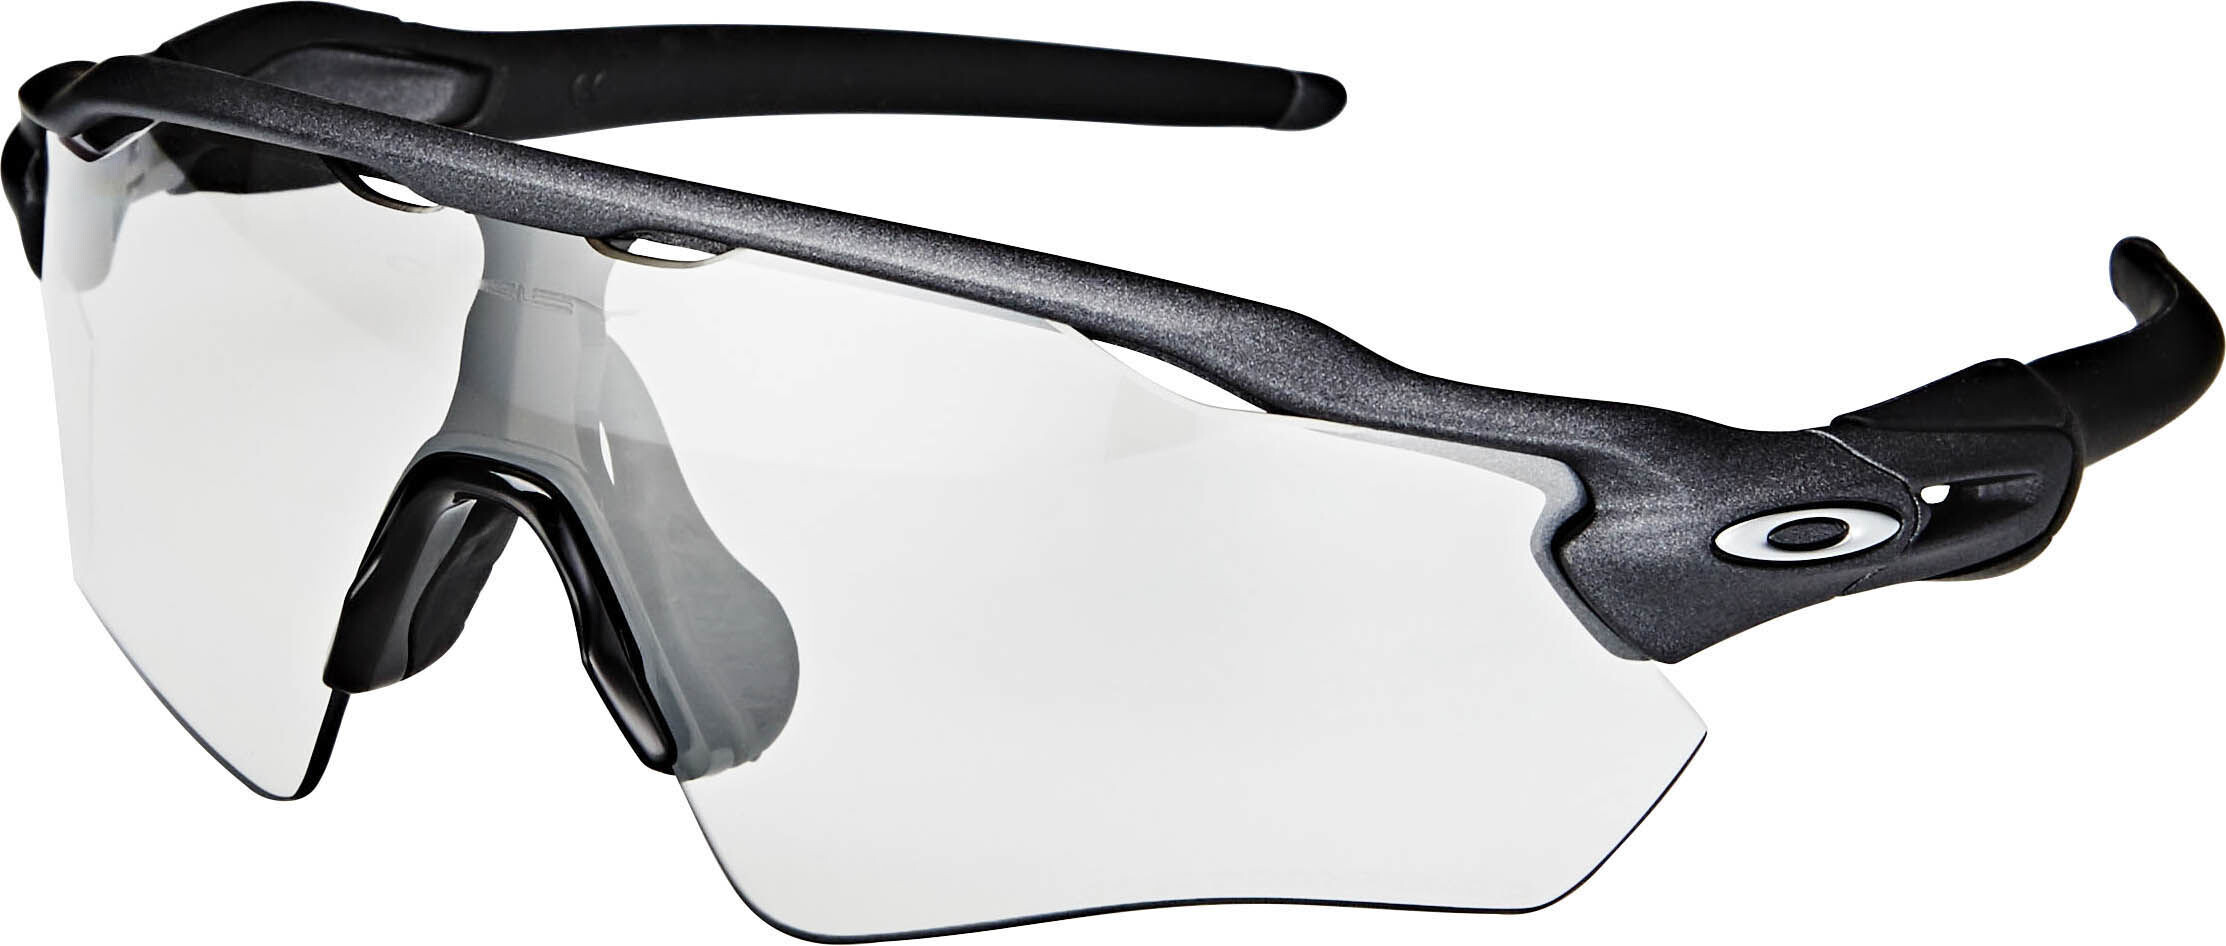 Oakley Radar EV Path Sunglasses Steel/Clear Black Iridium ...